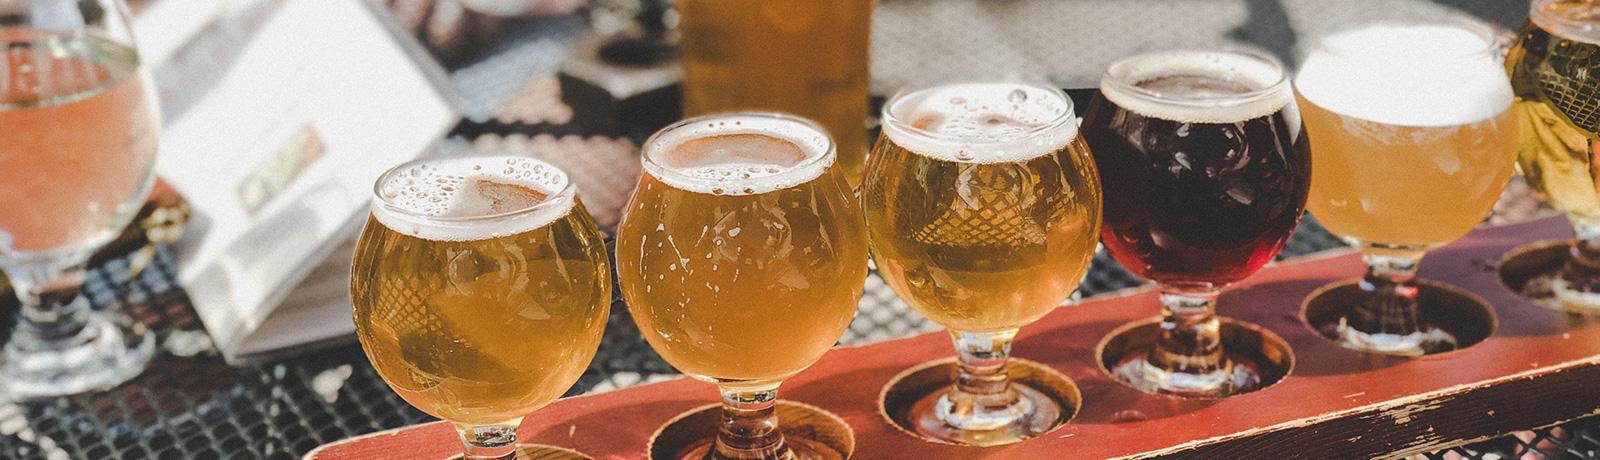 cheryl cade beer tasting